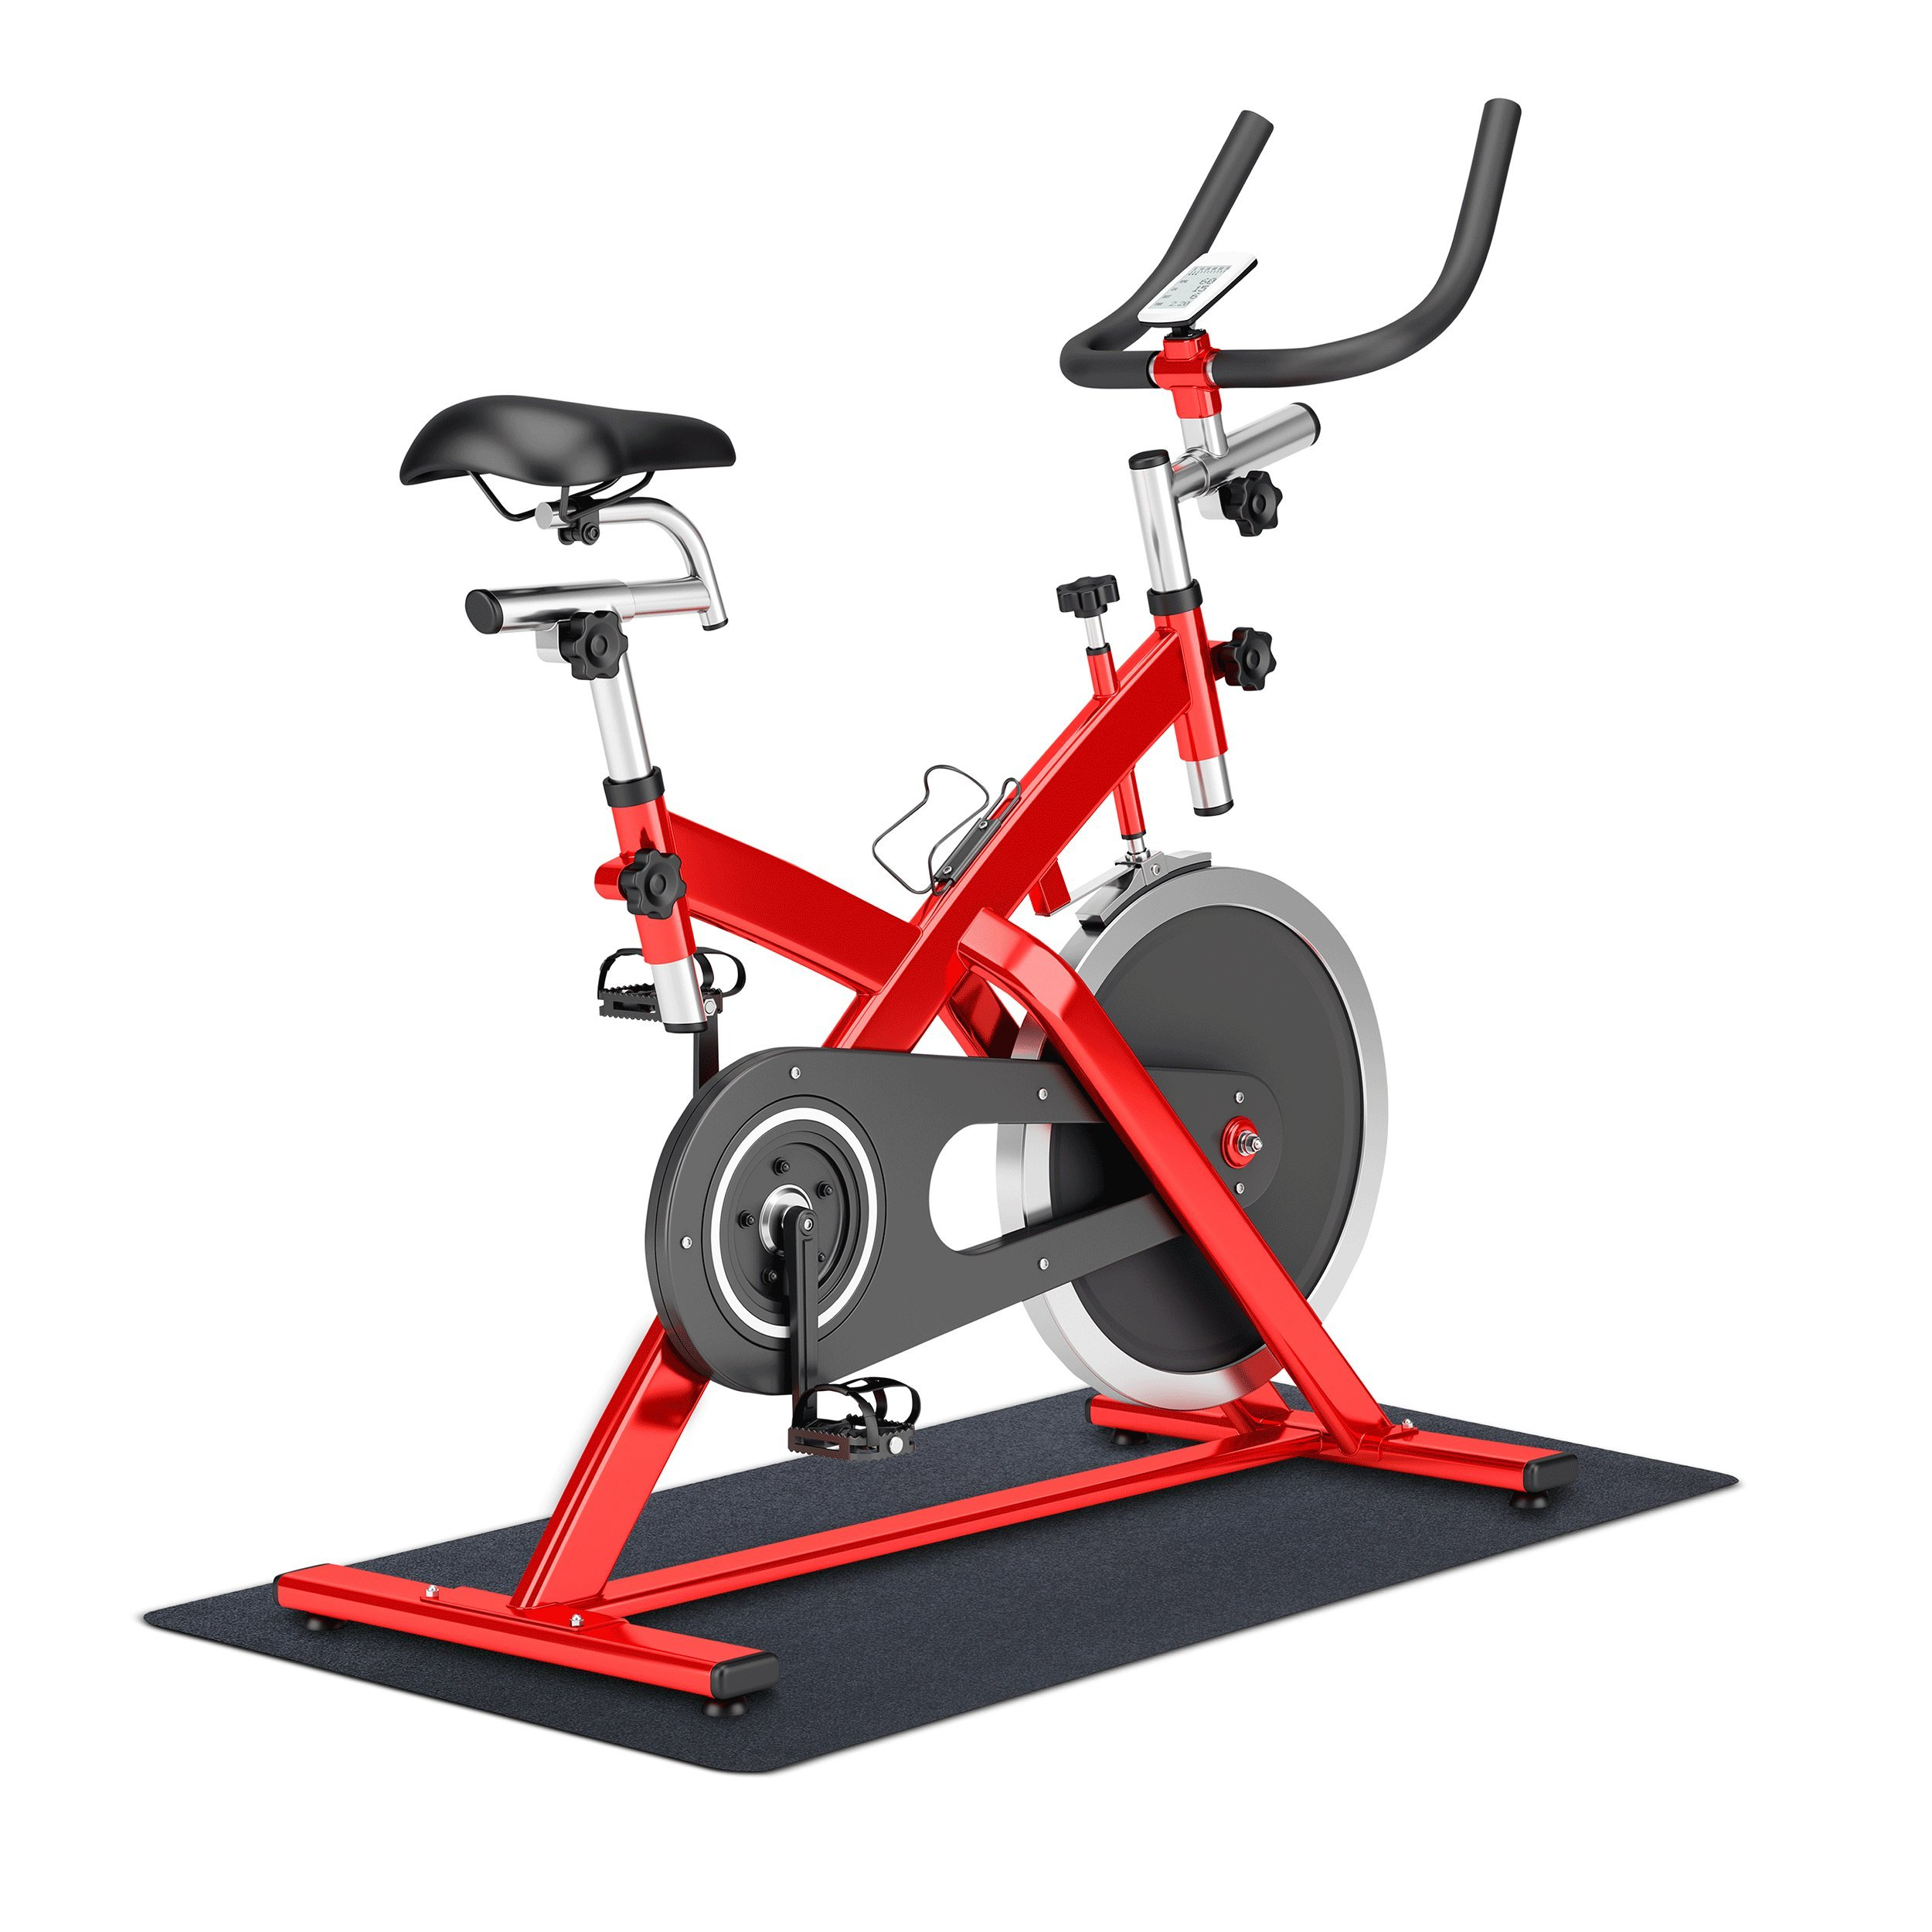 MotionTex 8M-110-24C-5 Fitness Equipment Mat, 24'' x 60'', Black by MotionTex